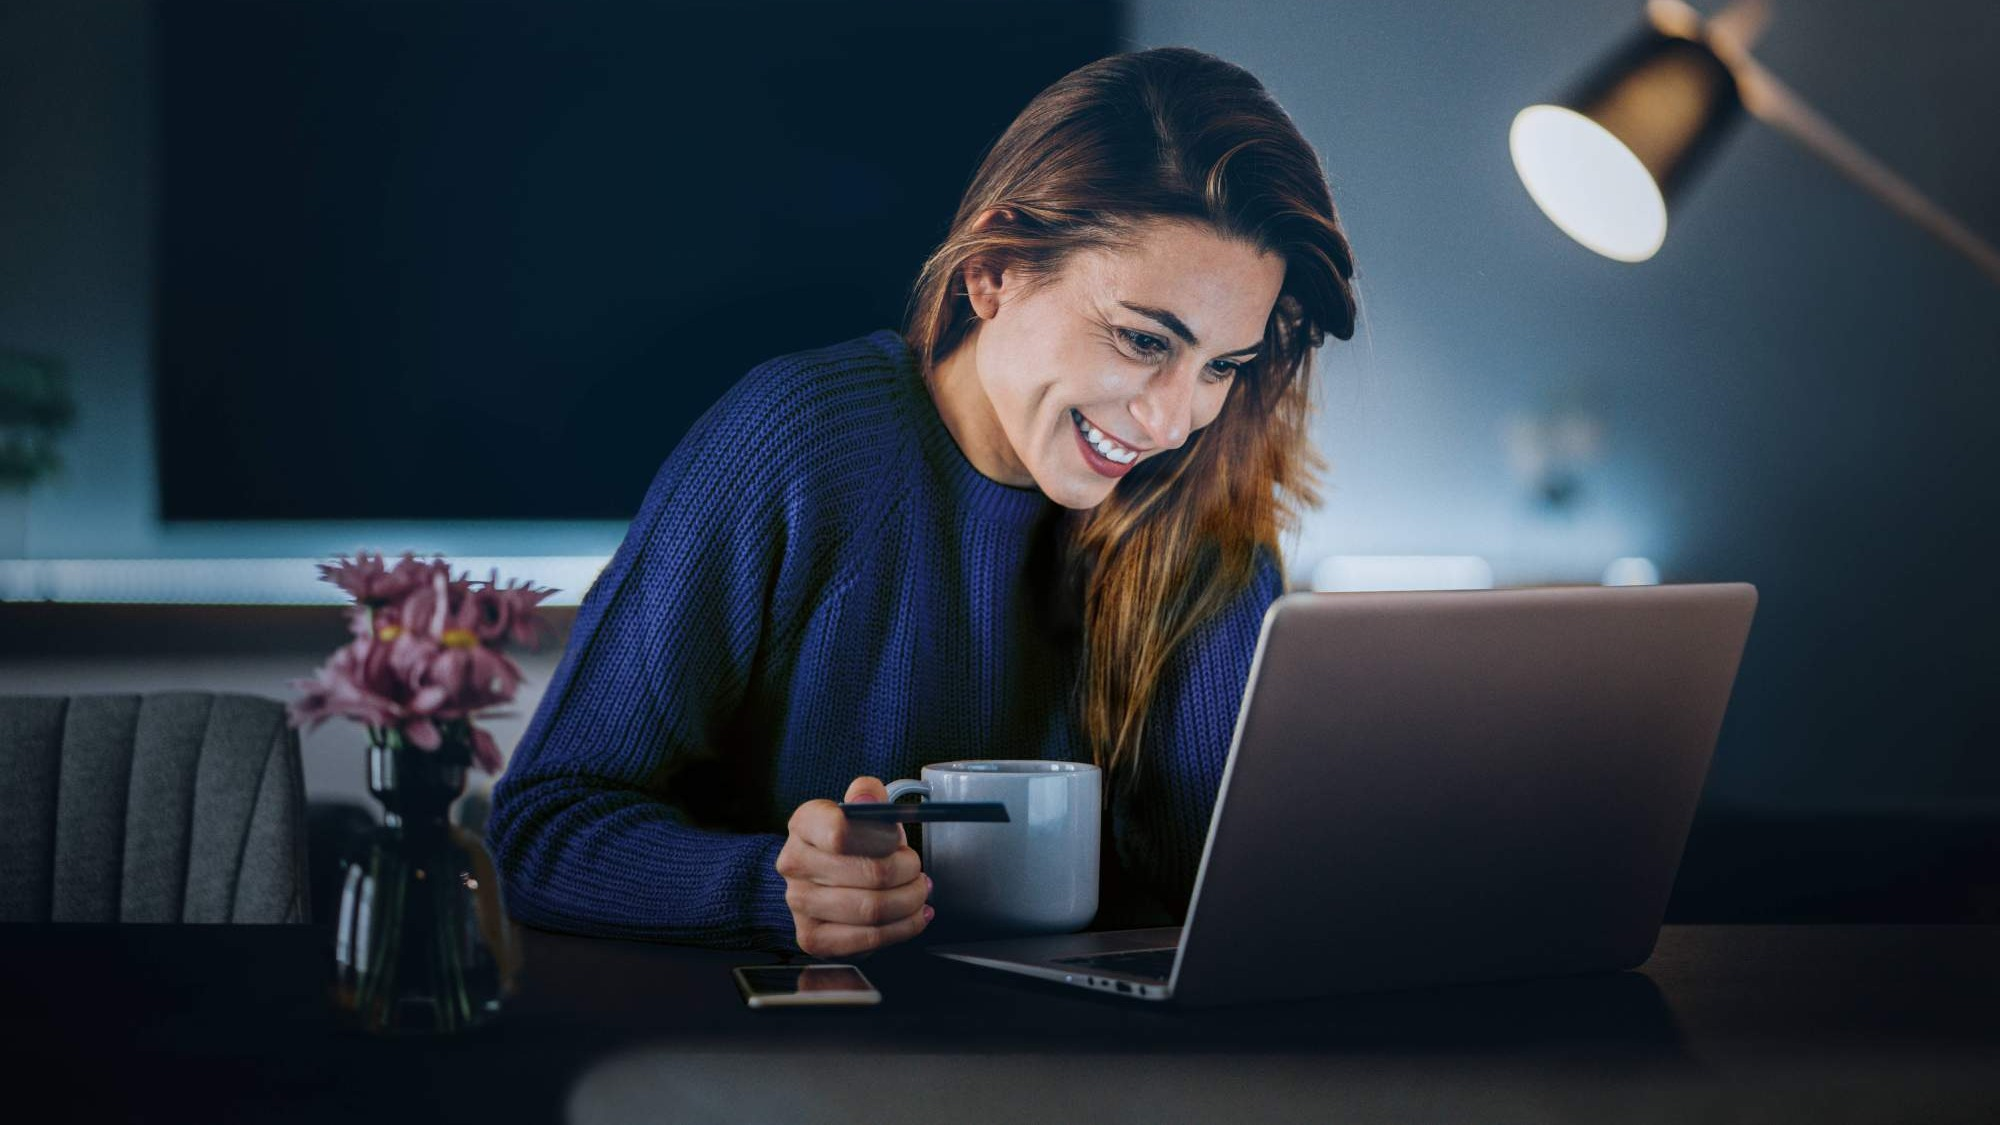 Kvinna sitter med en laptop